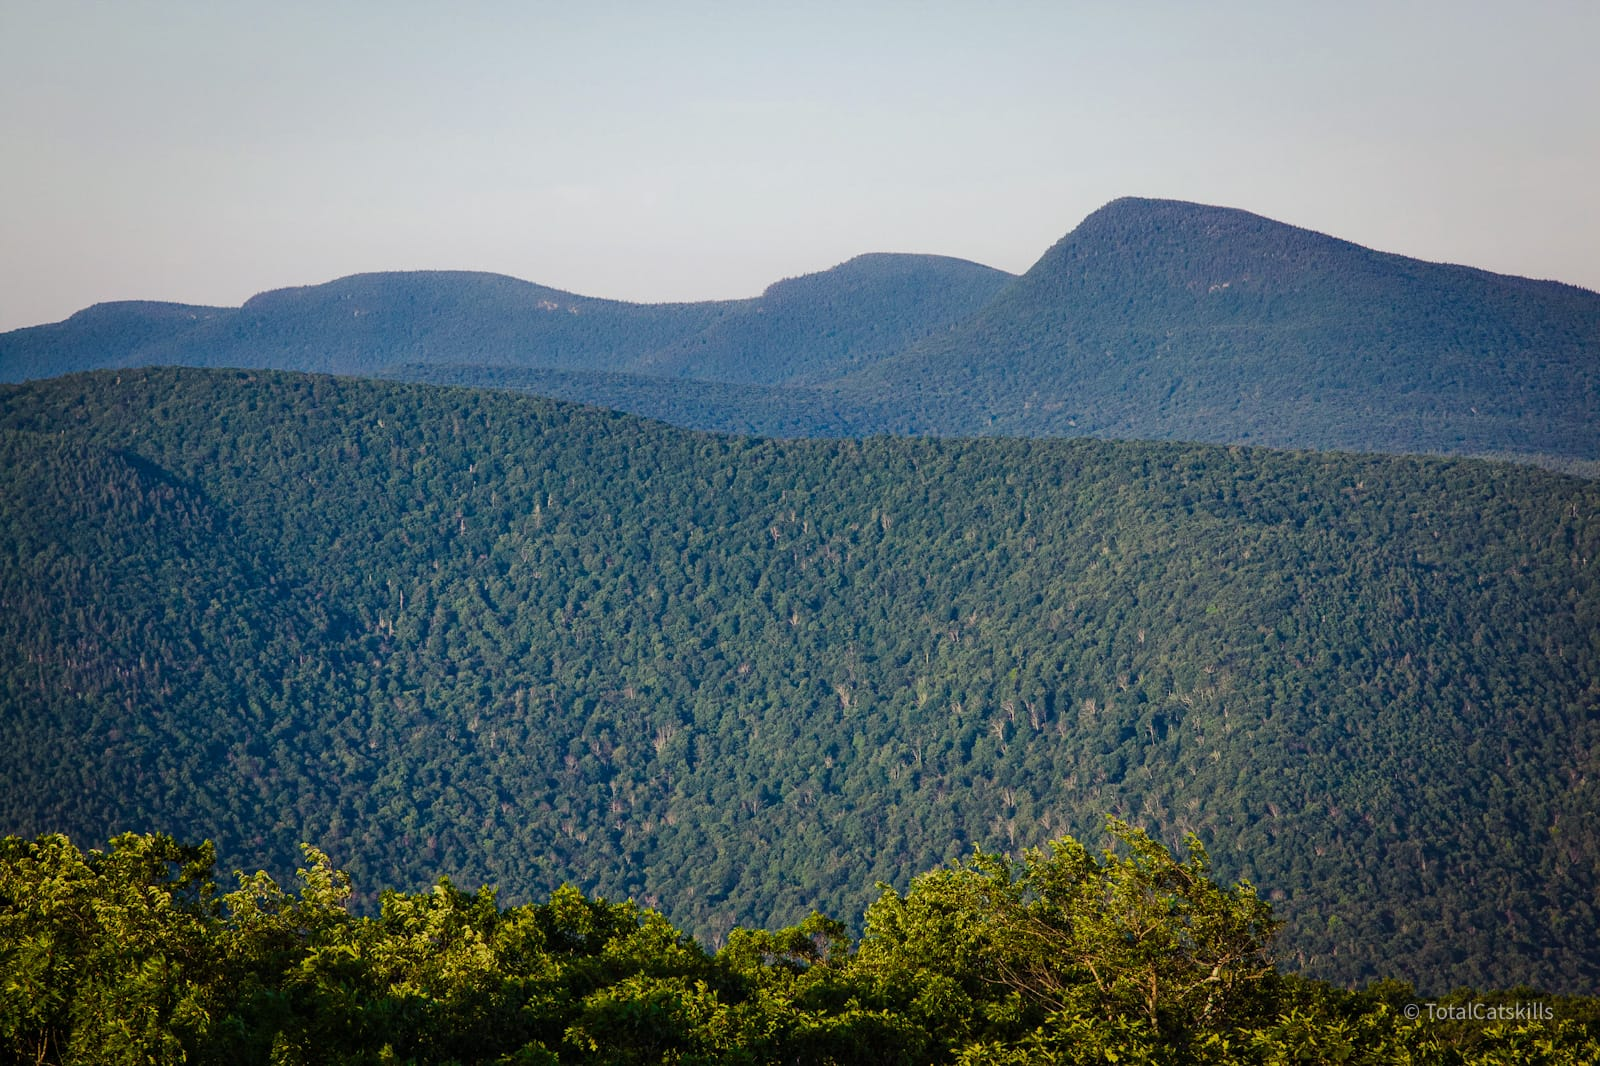 mountain peaks in distance